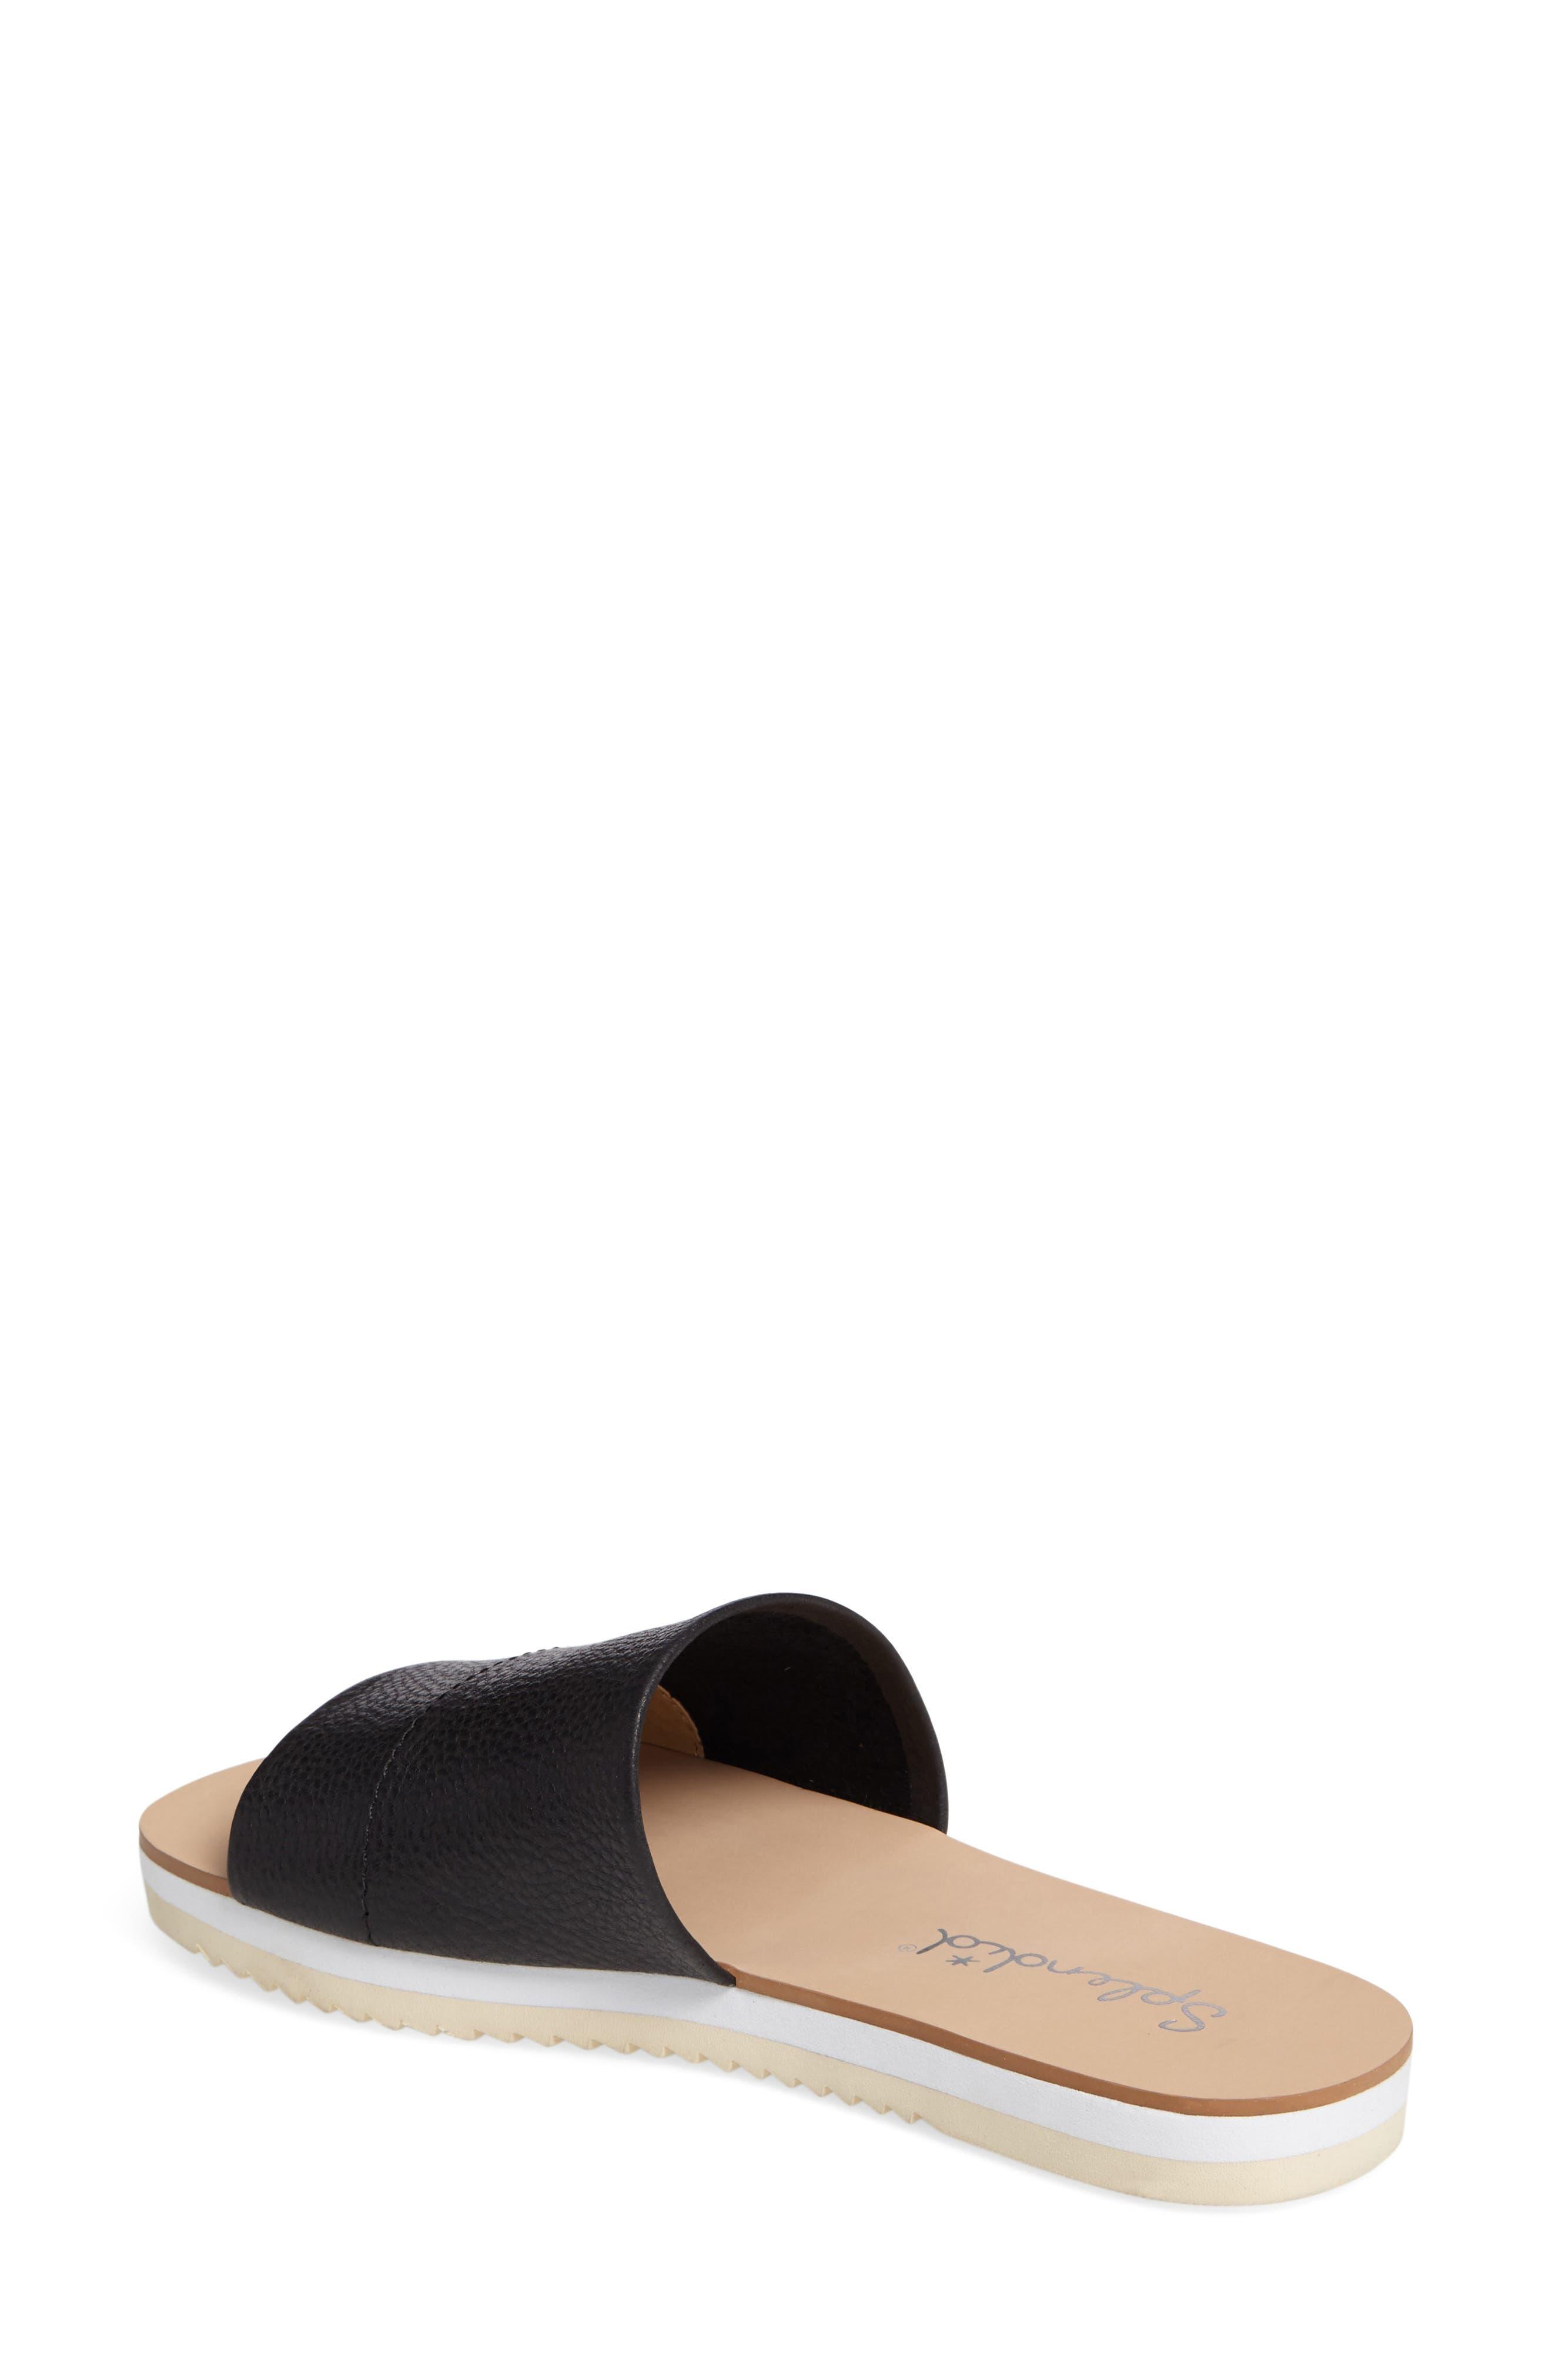 Jazz Slide Sandal,                             Alternate thumbnail 2, color,                             Black Leather